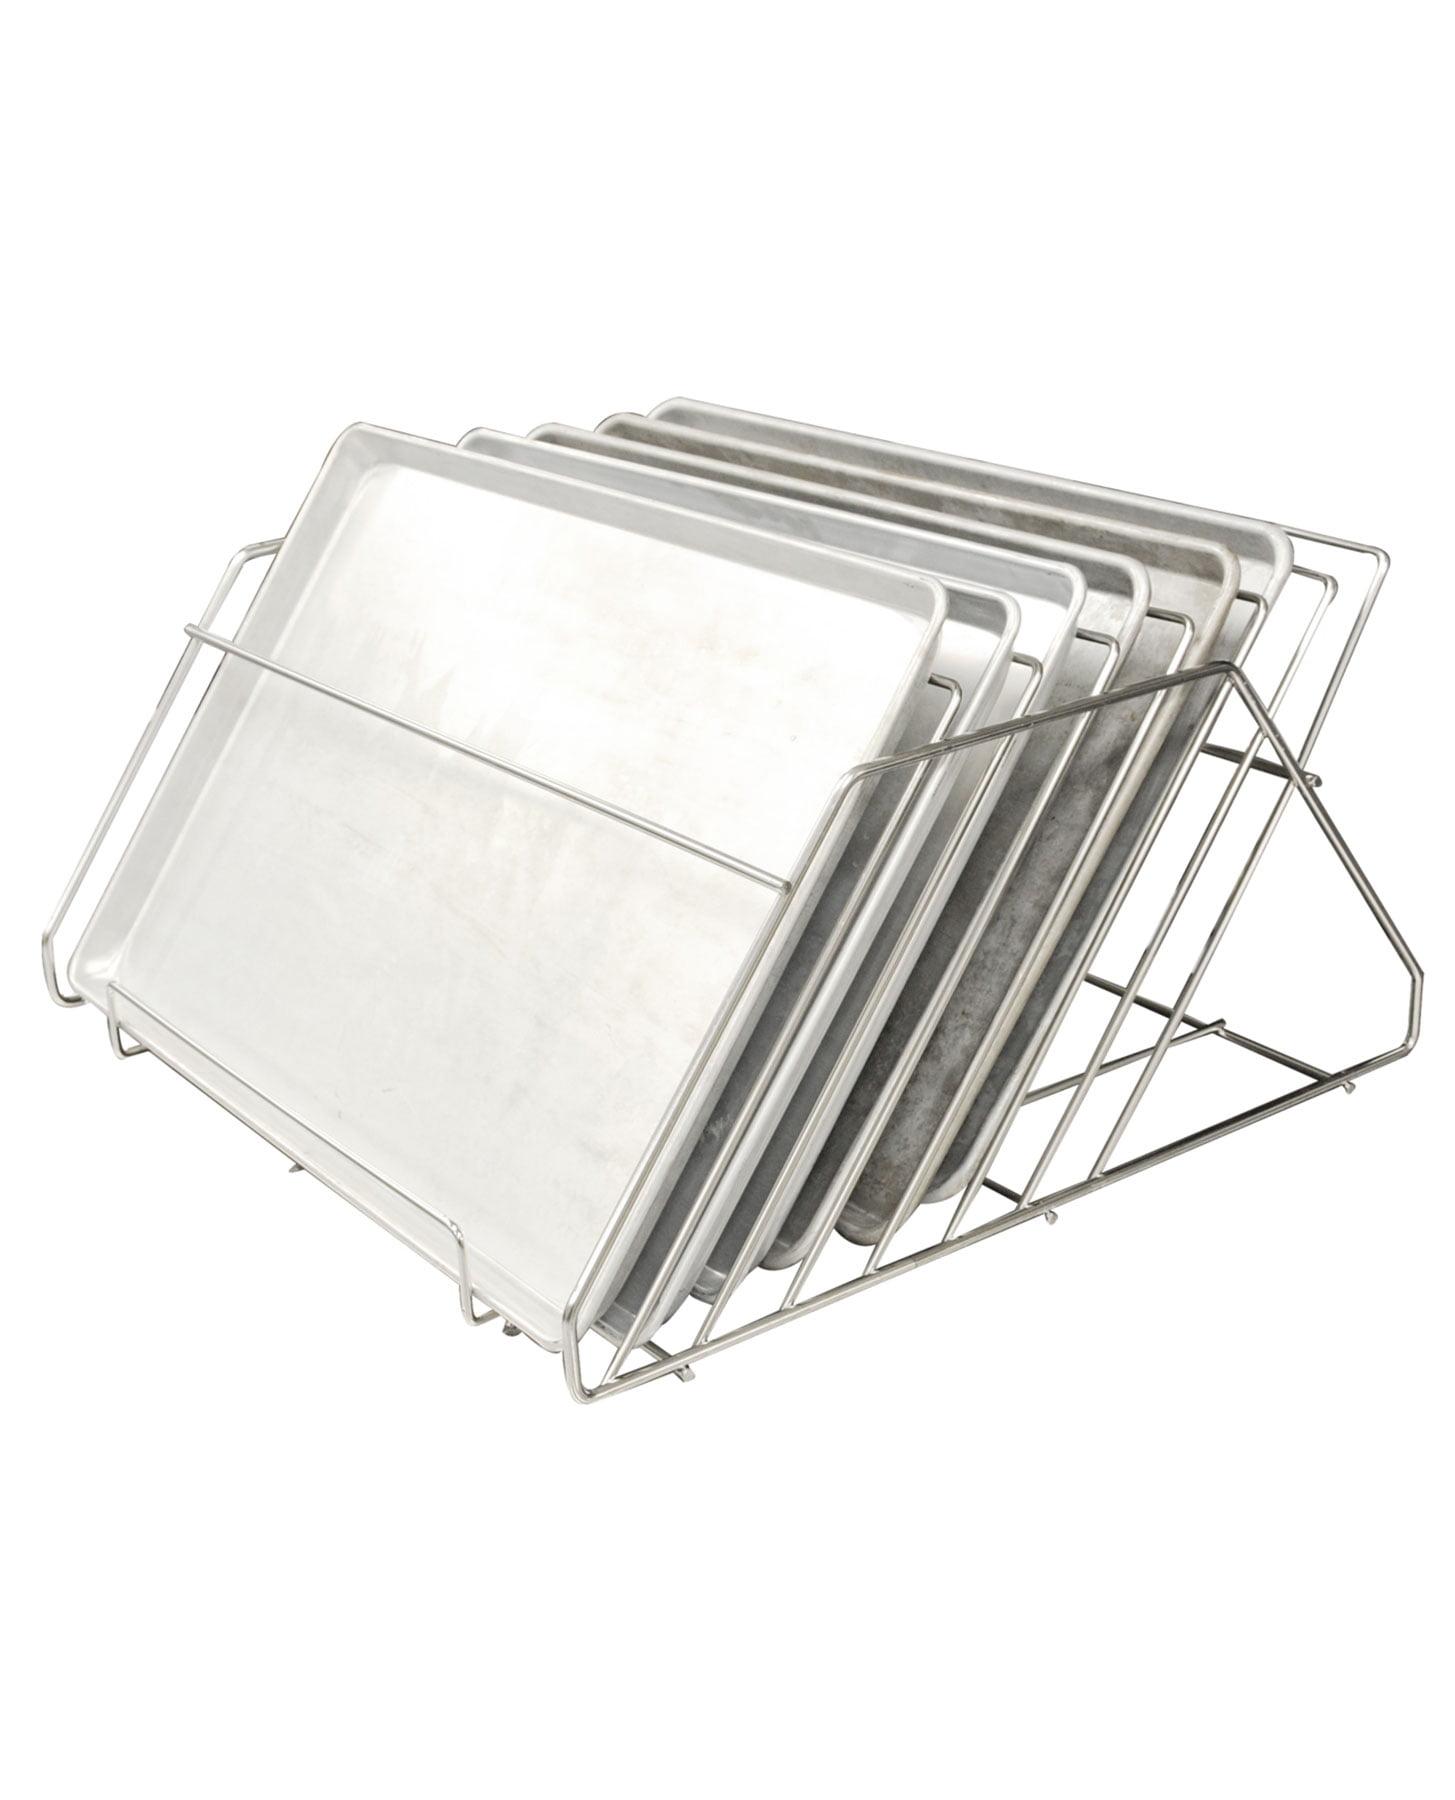 Power-sink Tray Rack